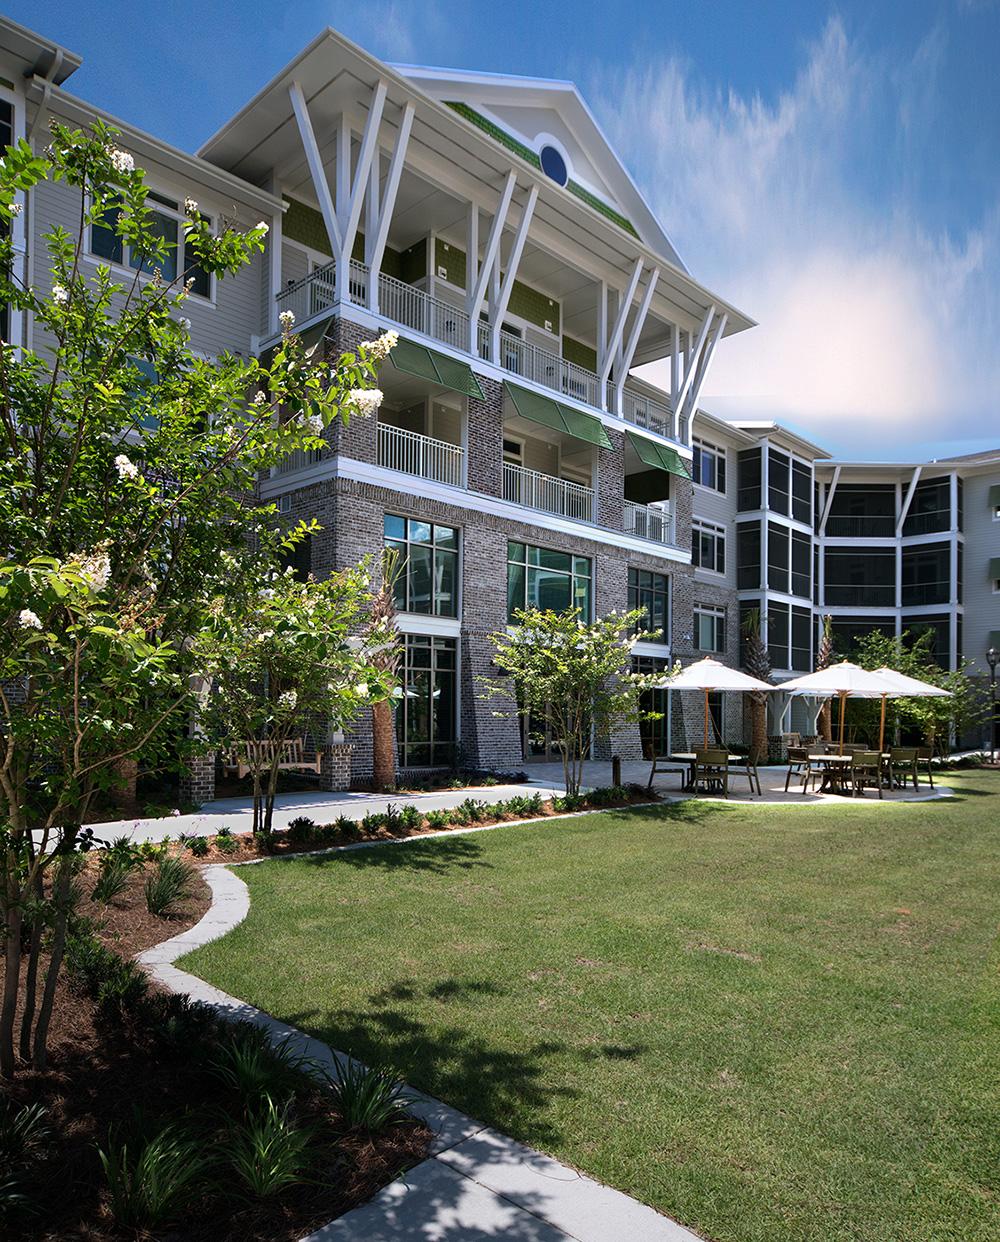 Summer Cove Apartments: Waterwalk At Shelter Cove Towne Centre Hilton Head Island